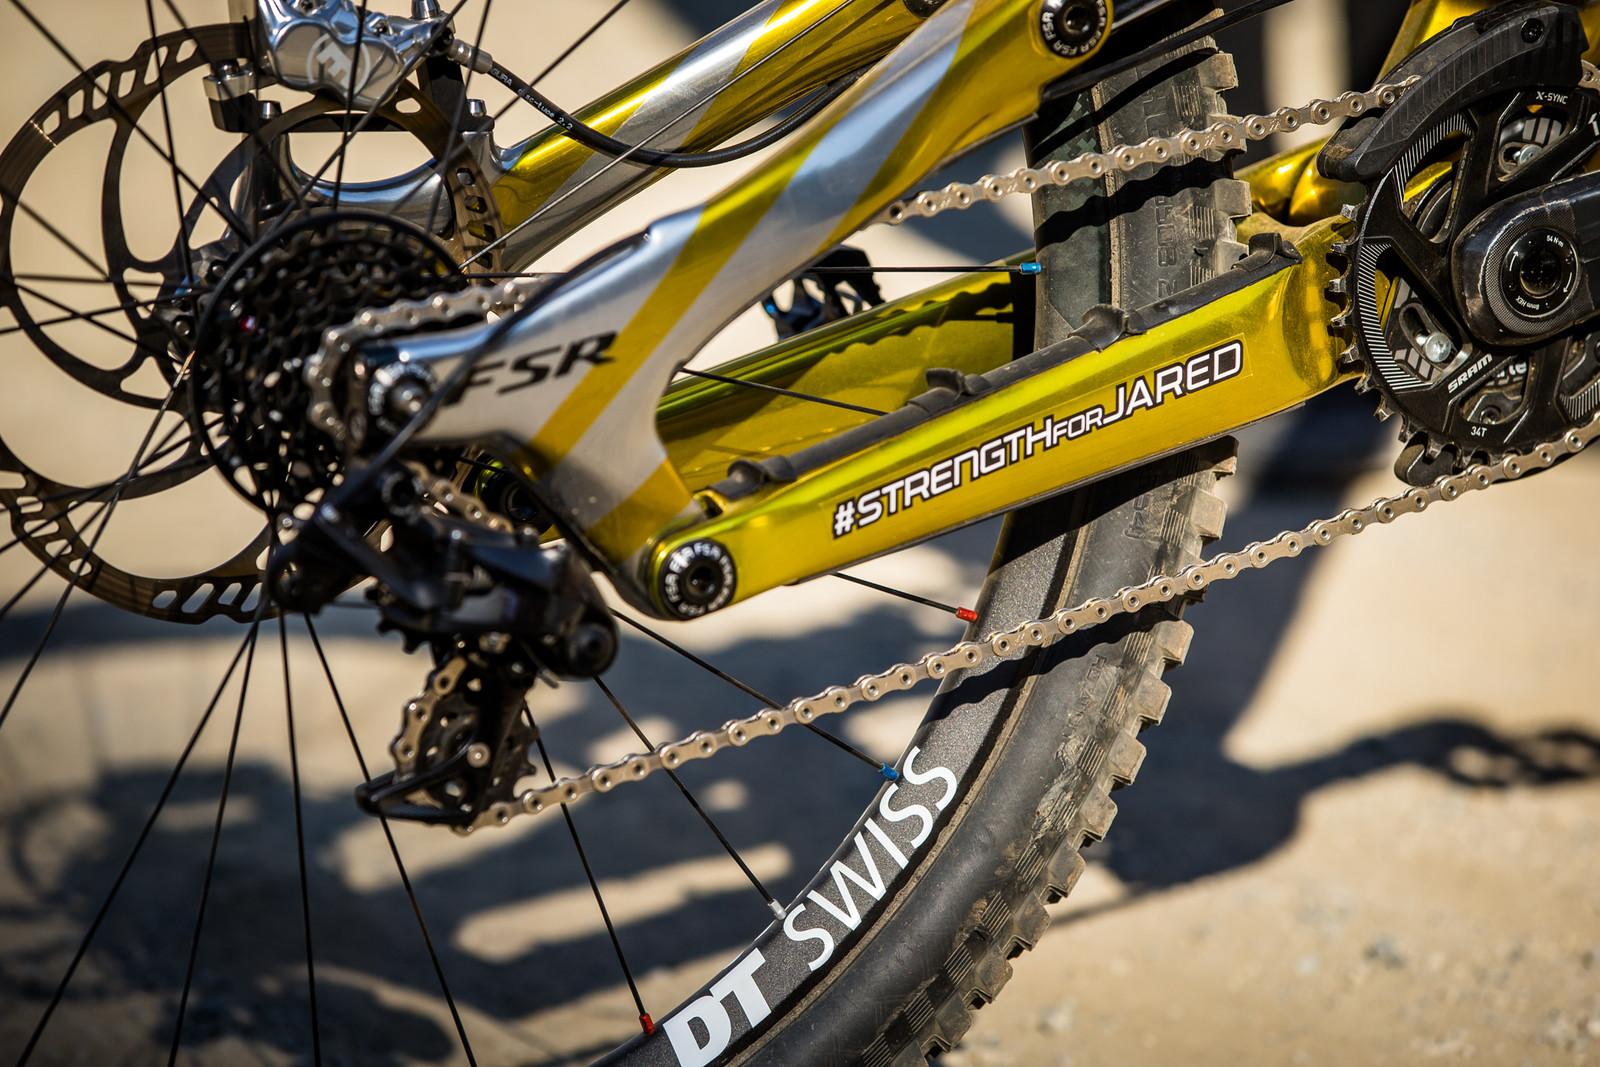 #strengthforjared - WINNING BIKE - Loic Bruni's Specialized Demo - Mountain Biking Pictures - Vital MTB